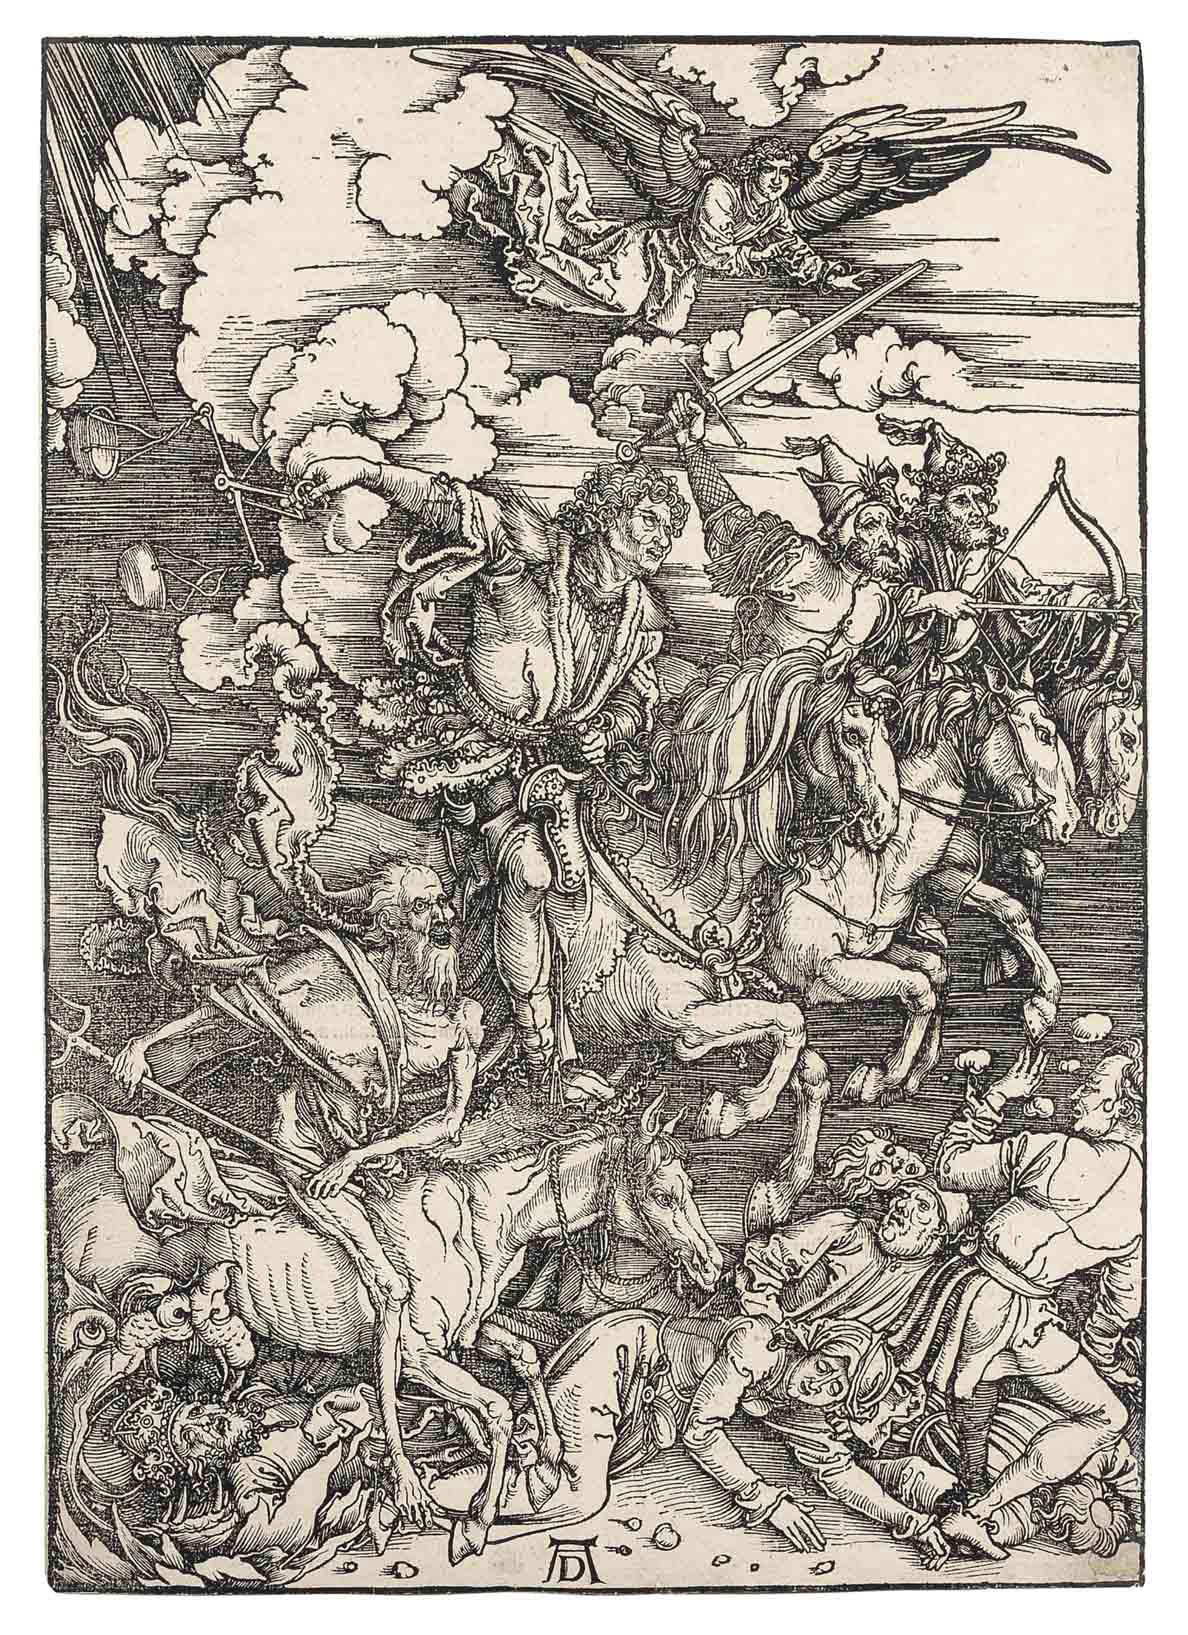 2011_cks_08006_0042_000_albrecht_durer_the_four_horsemen_from_the_apocalypse.jpg